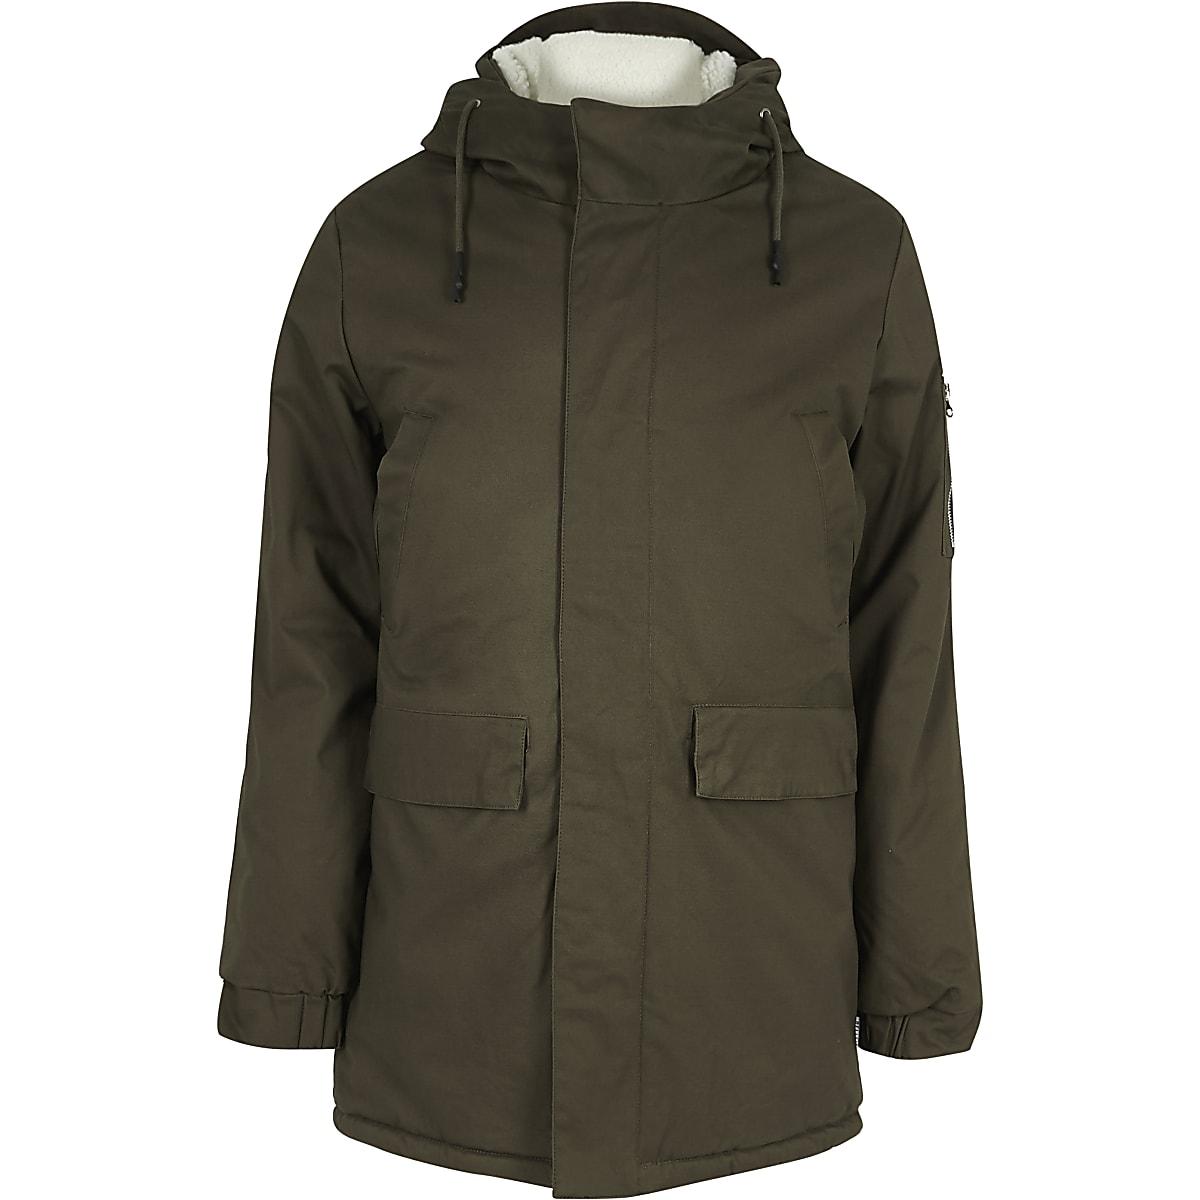 Khaki borg lined hooded coat